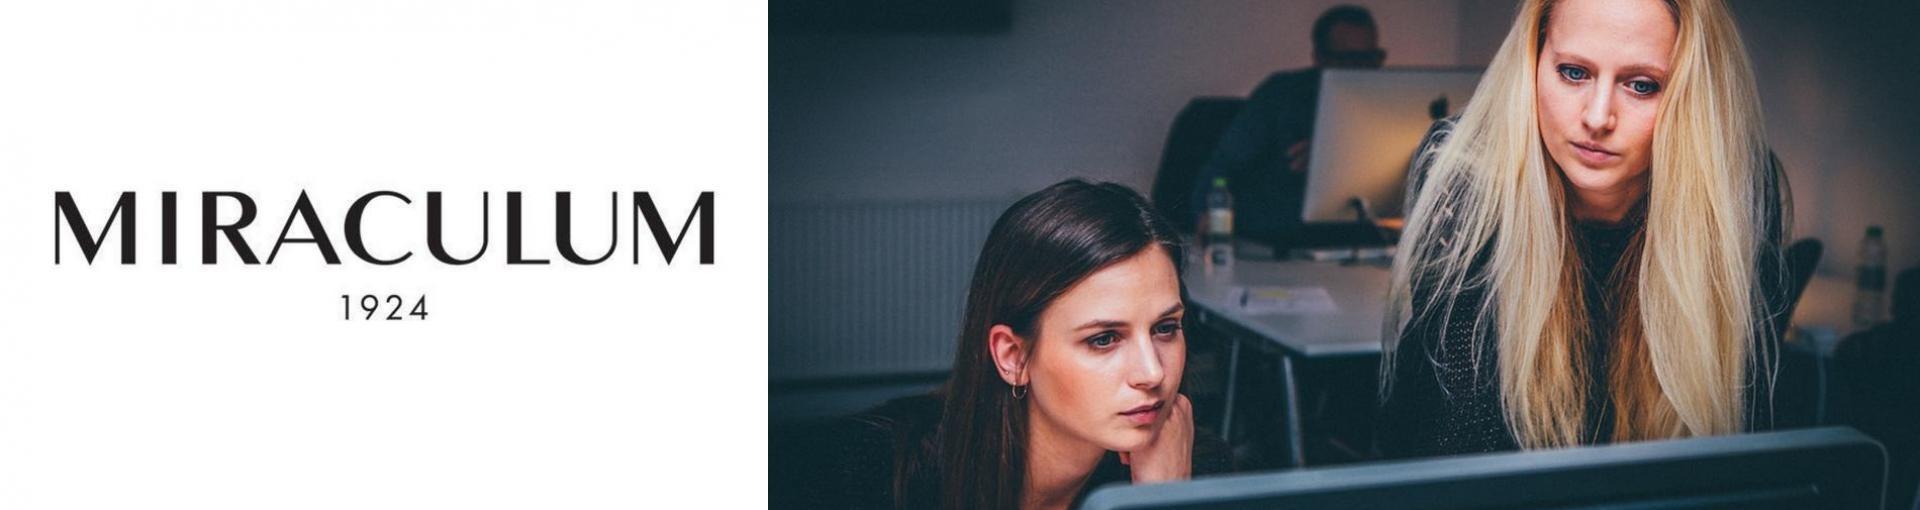 5c1d260257520 Oferta pracy  Miraculum - Brand Manager